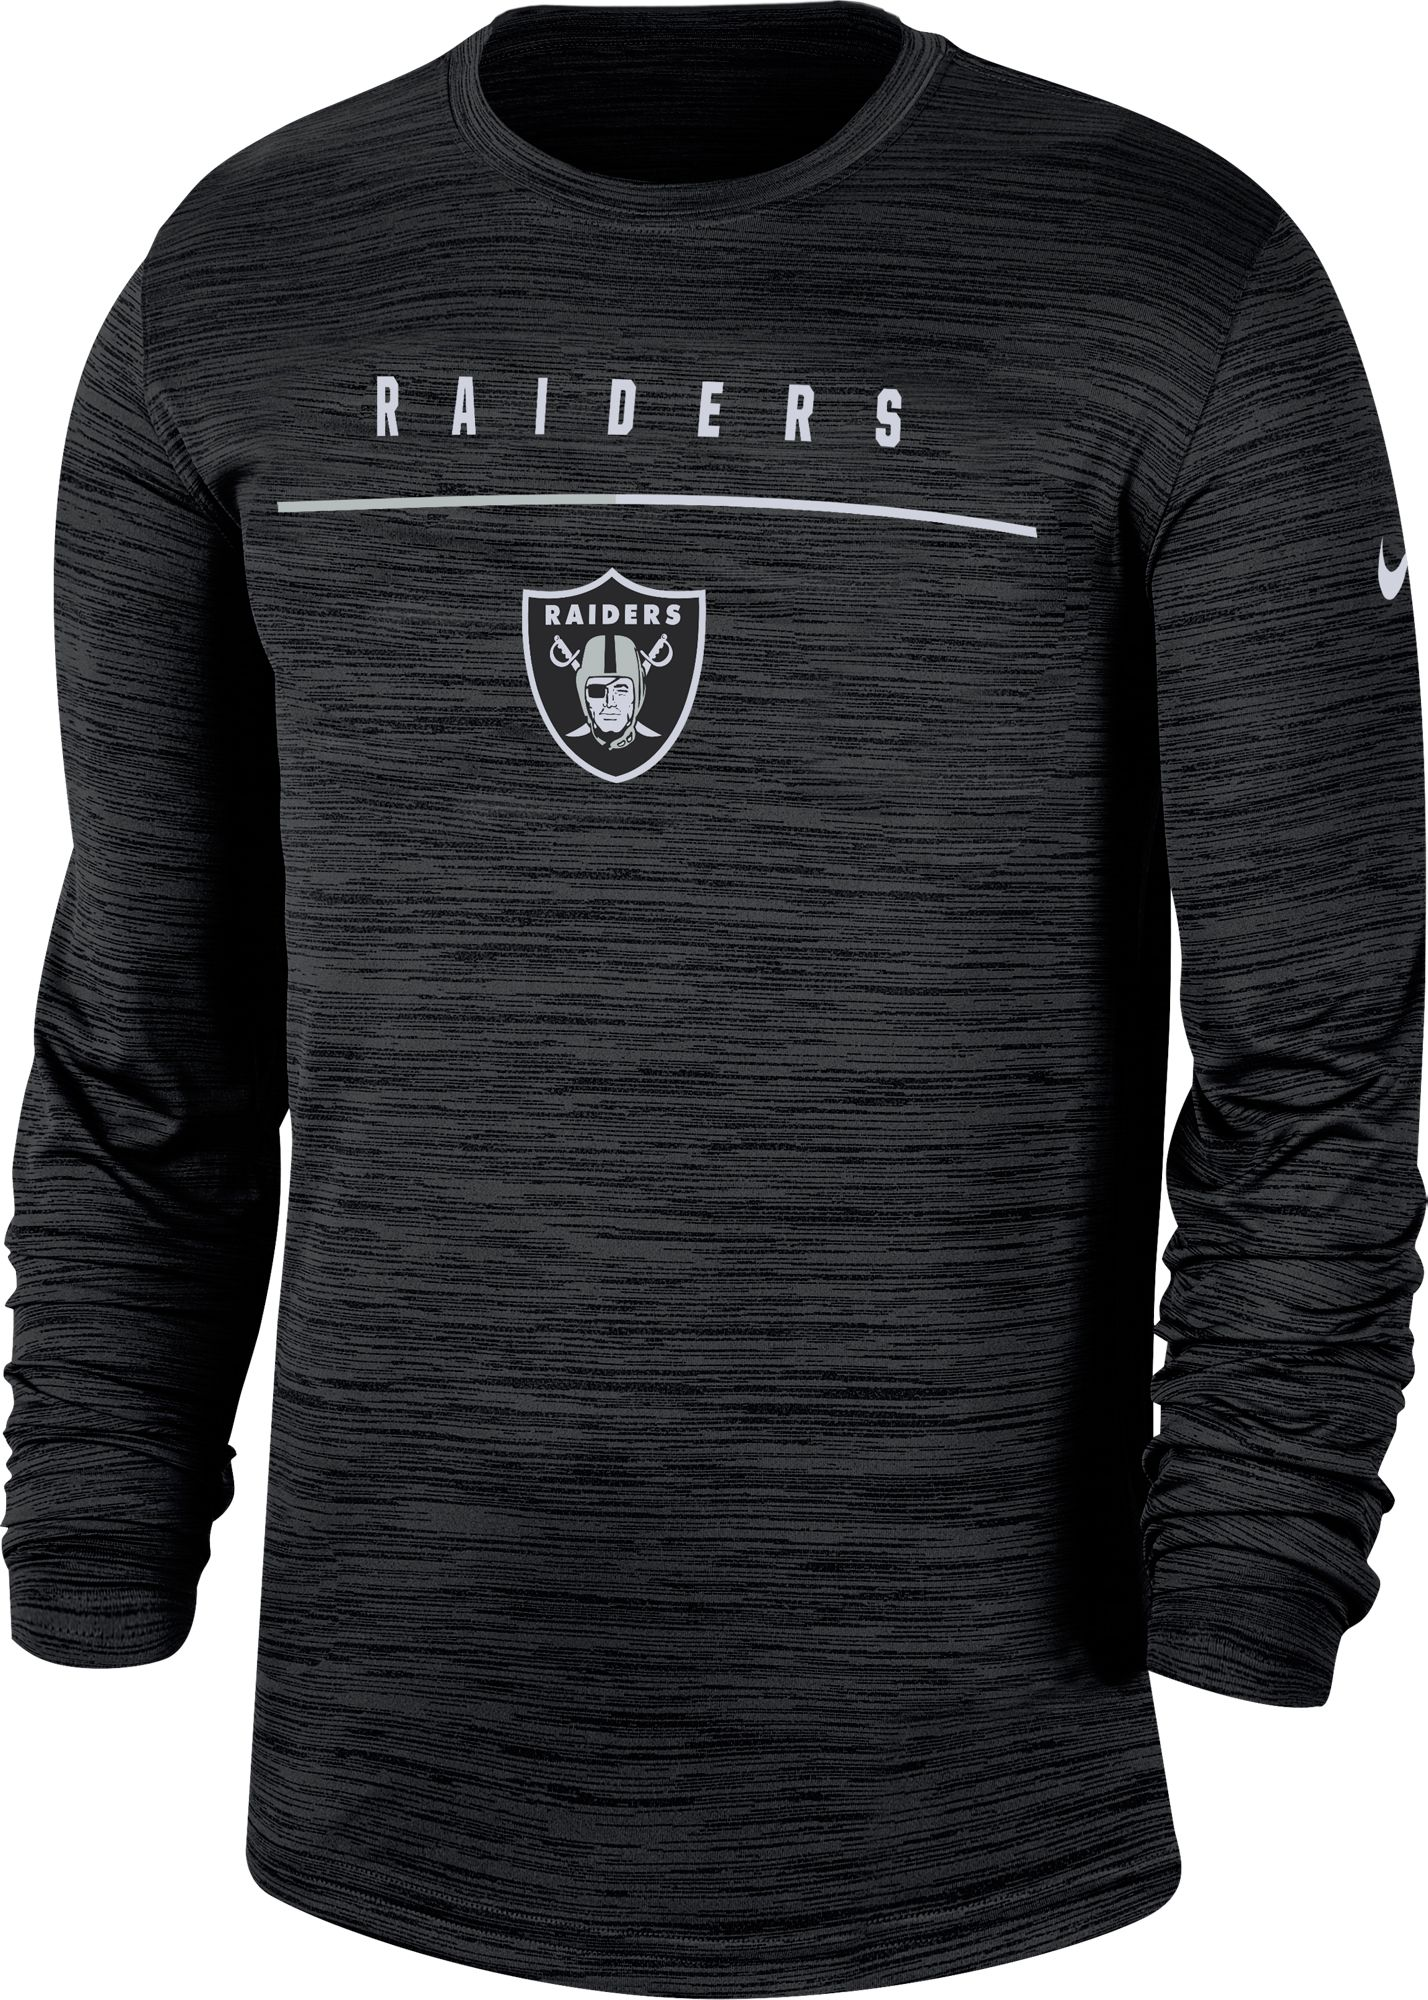 raiders shirt mens